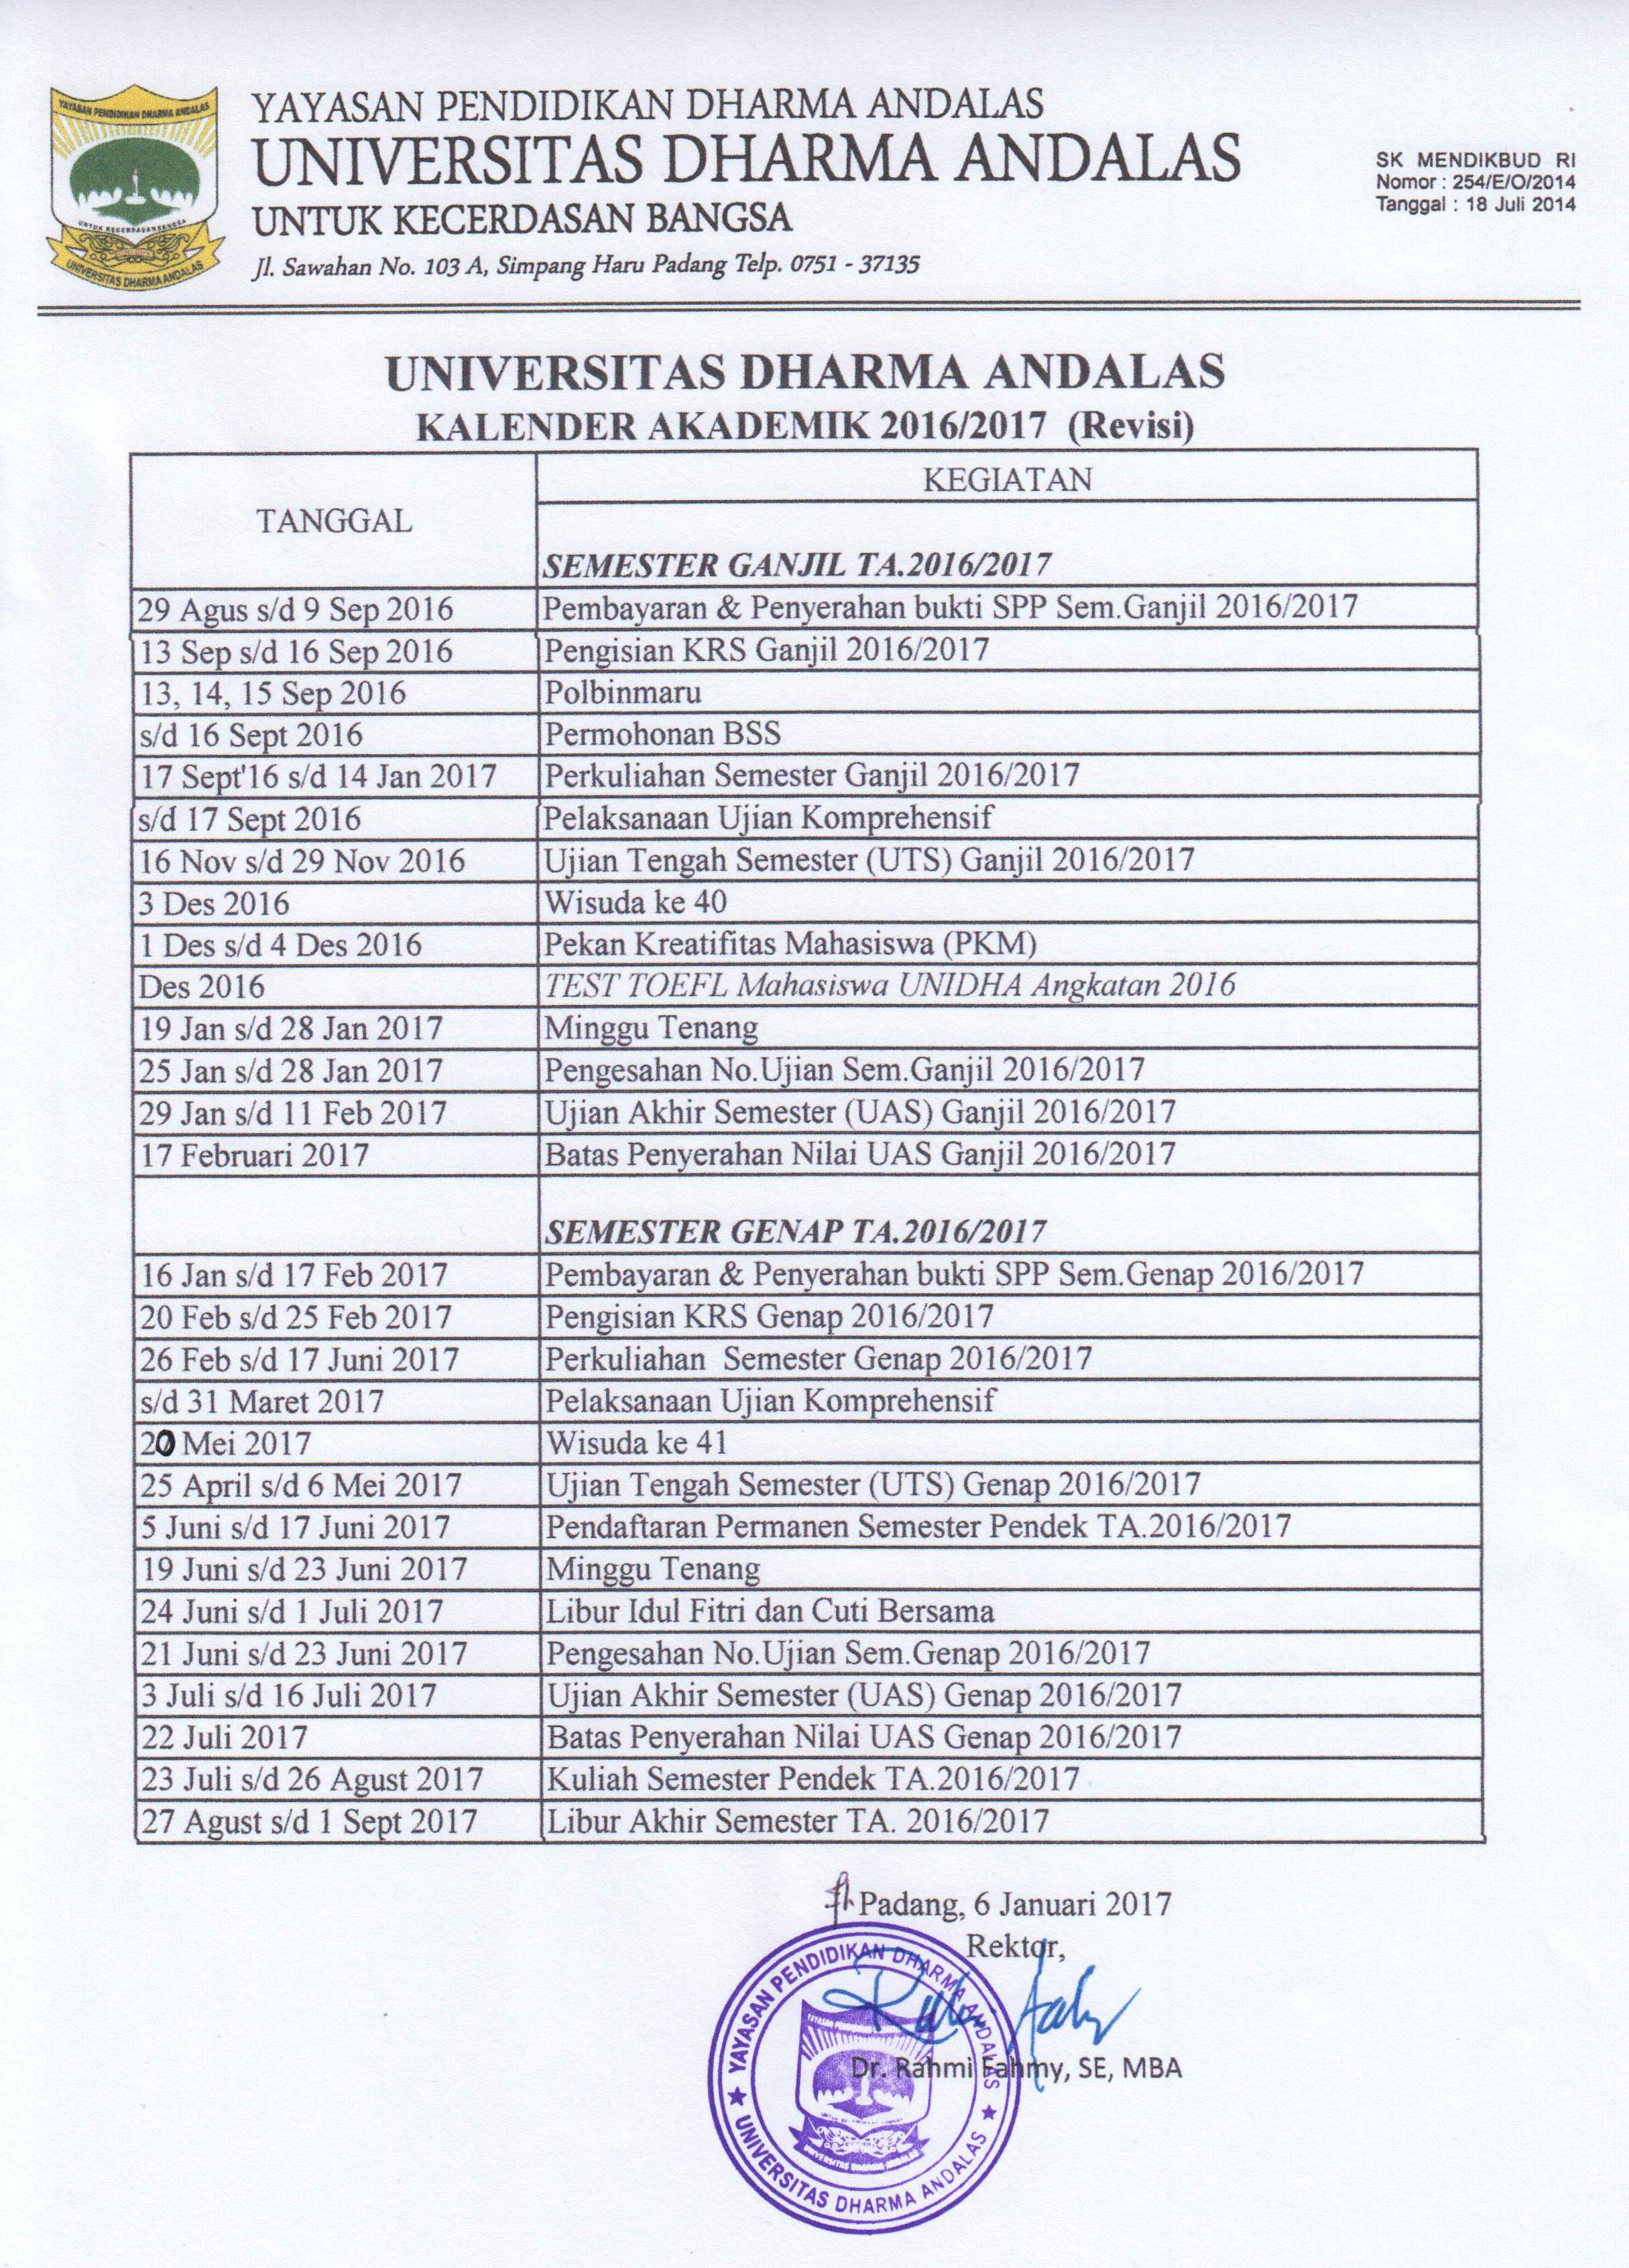 Kalender Akademik 20162017